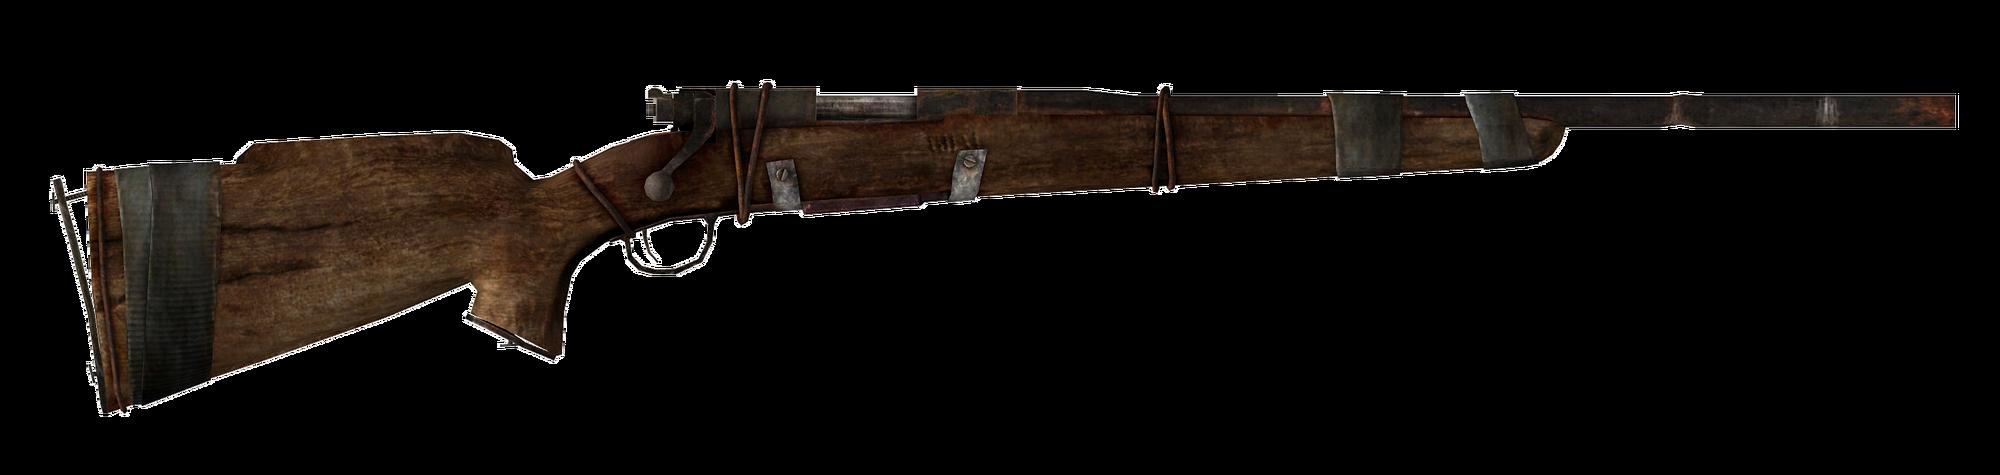 Hunting rifle (Fallout 3)   Fallout Wiki   Fandom powered ...